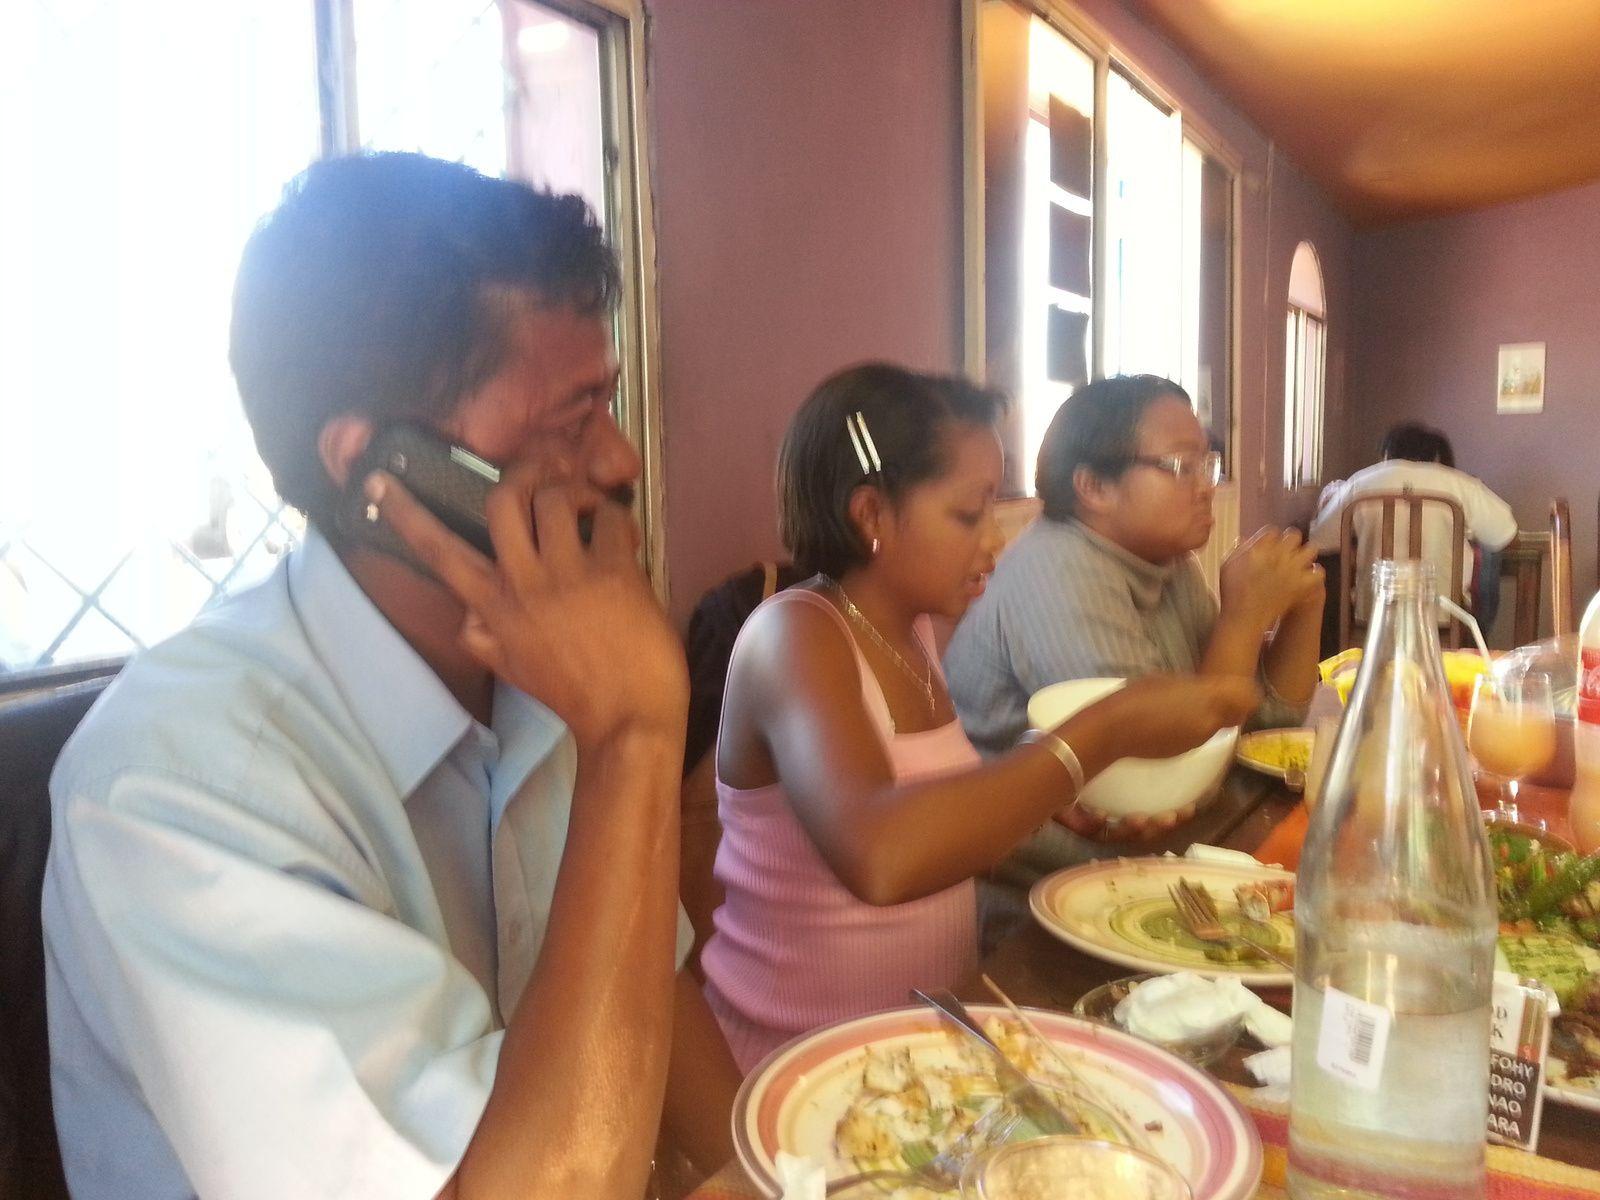 déjeuner &quot&#x3B;la marais&quot&#x3B; ivandry et after